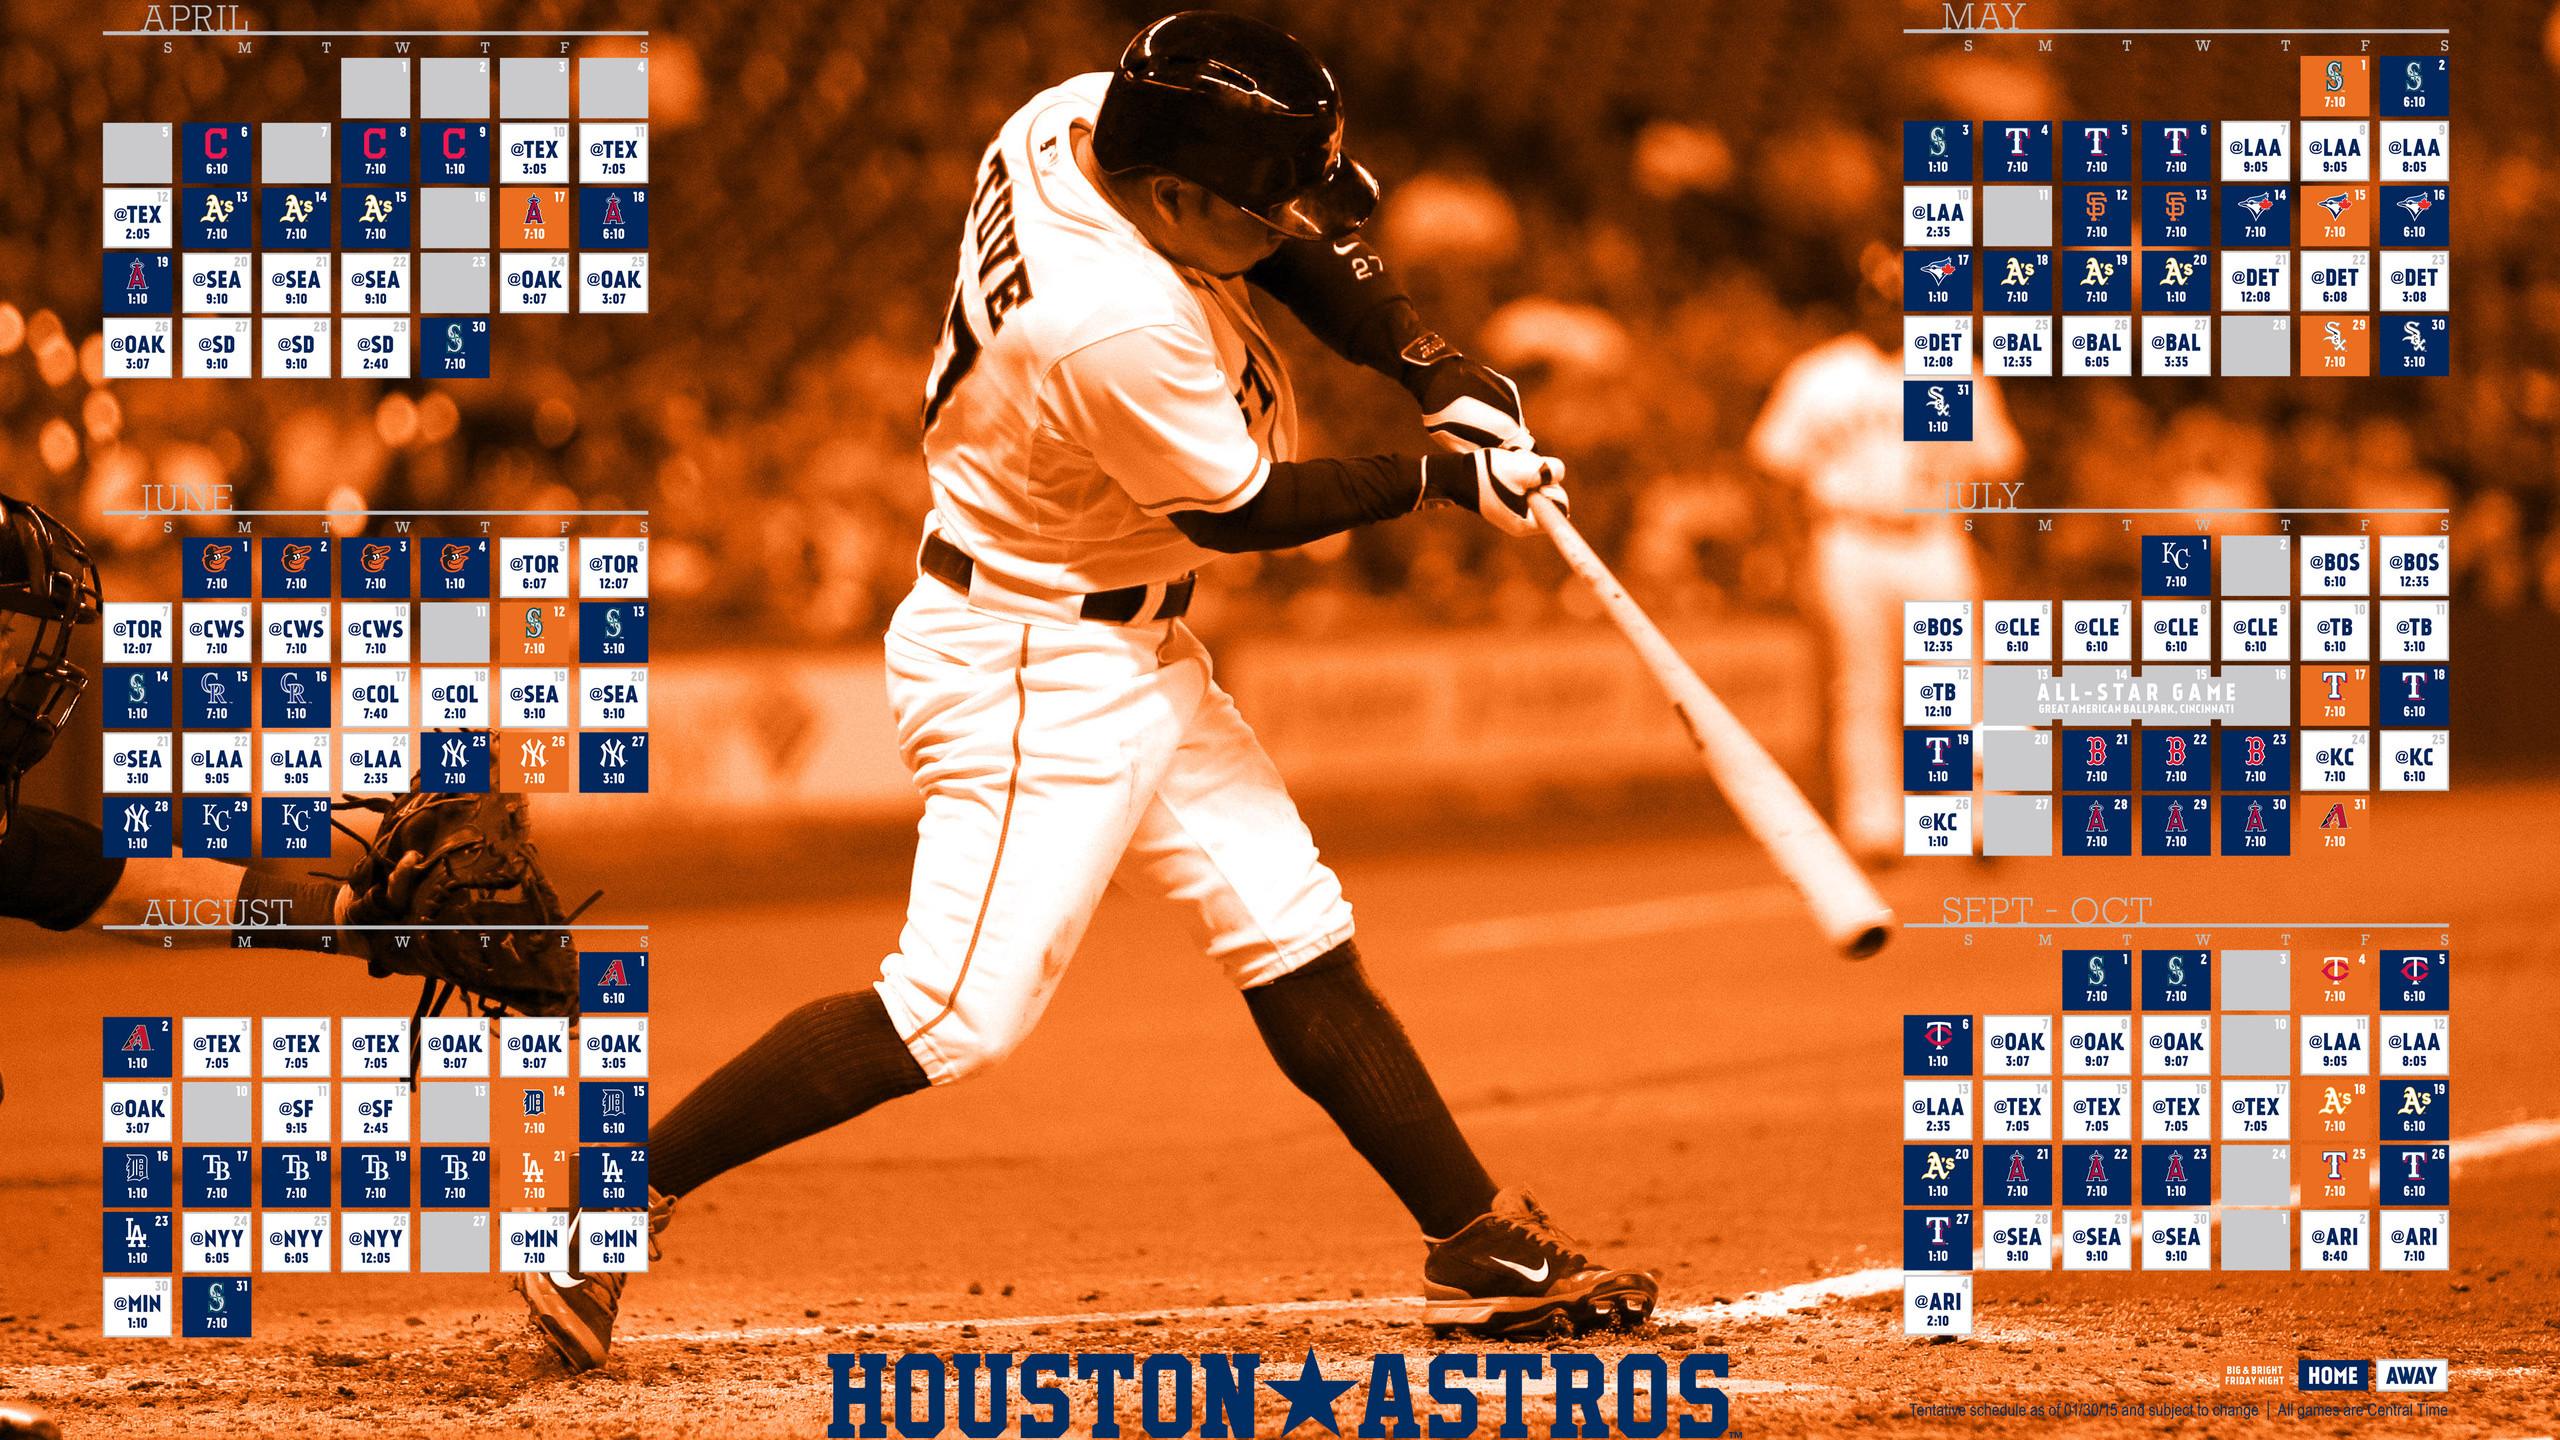 Pitcher, Sports, Mlb, Houston Astros Mlb Schedule 2015, Houston Astros